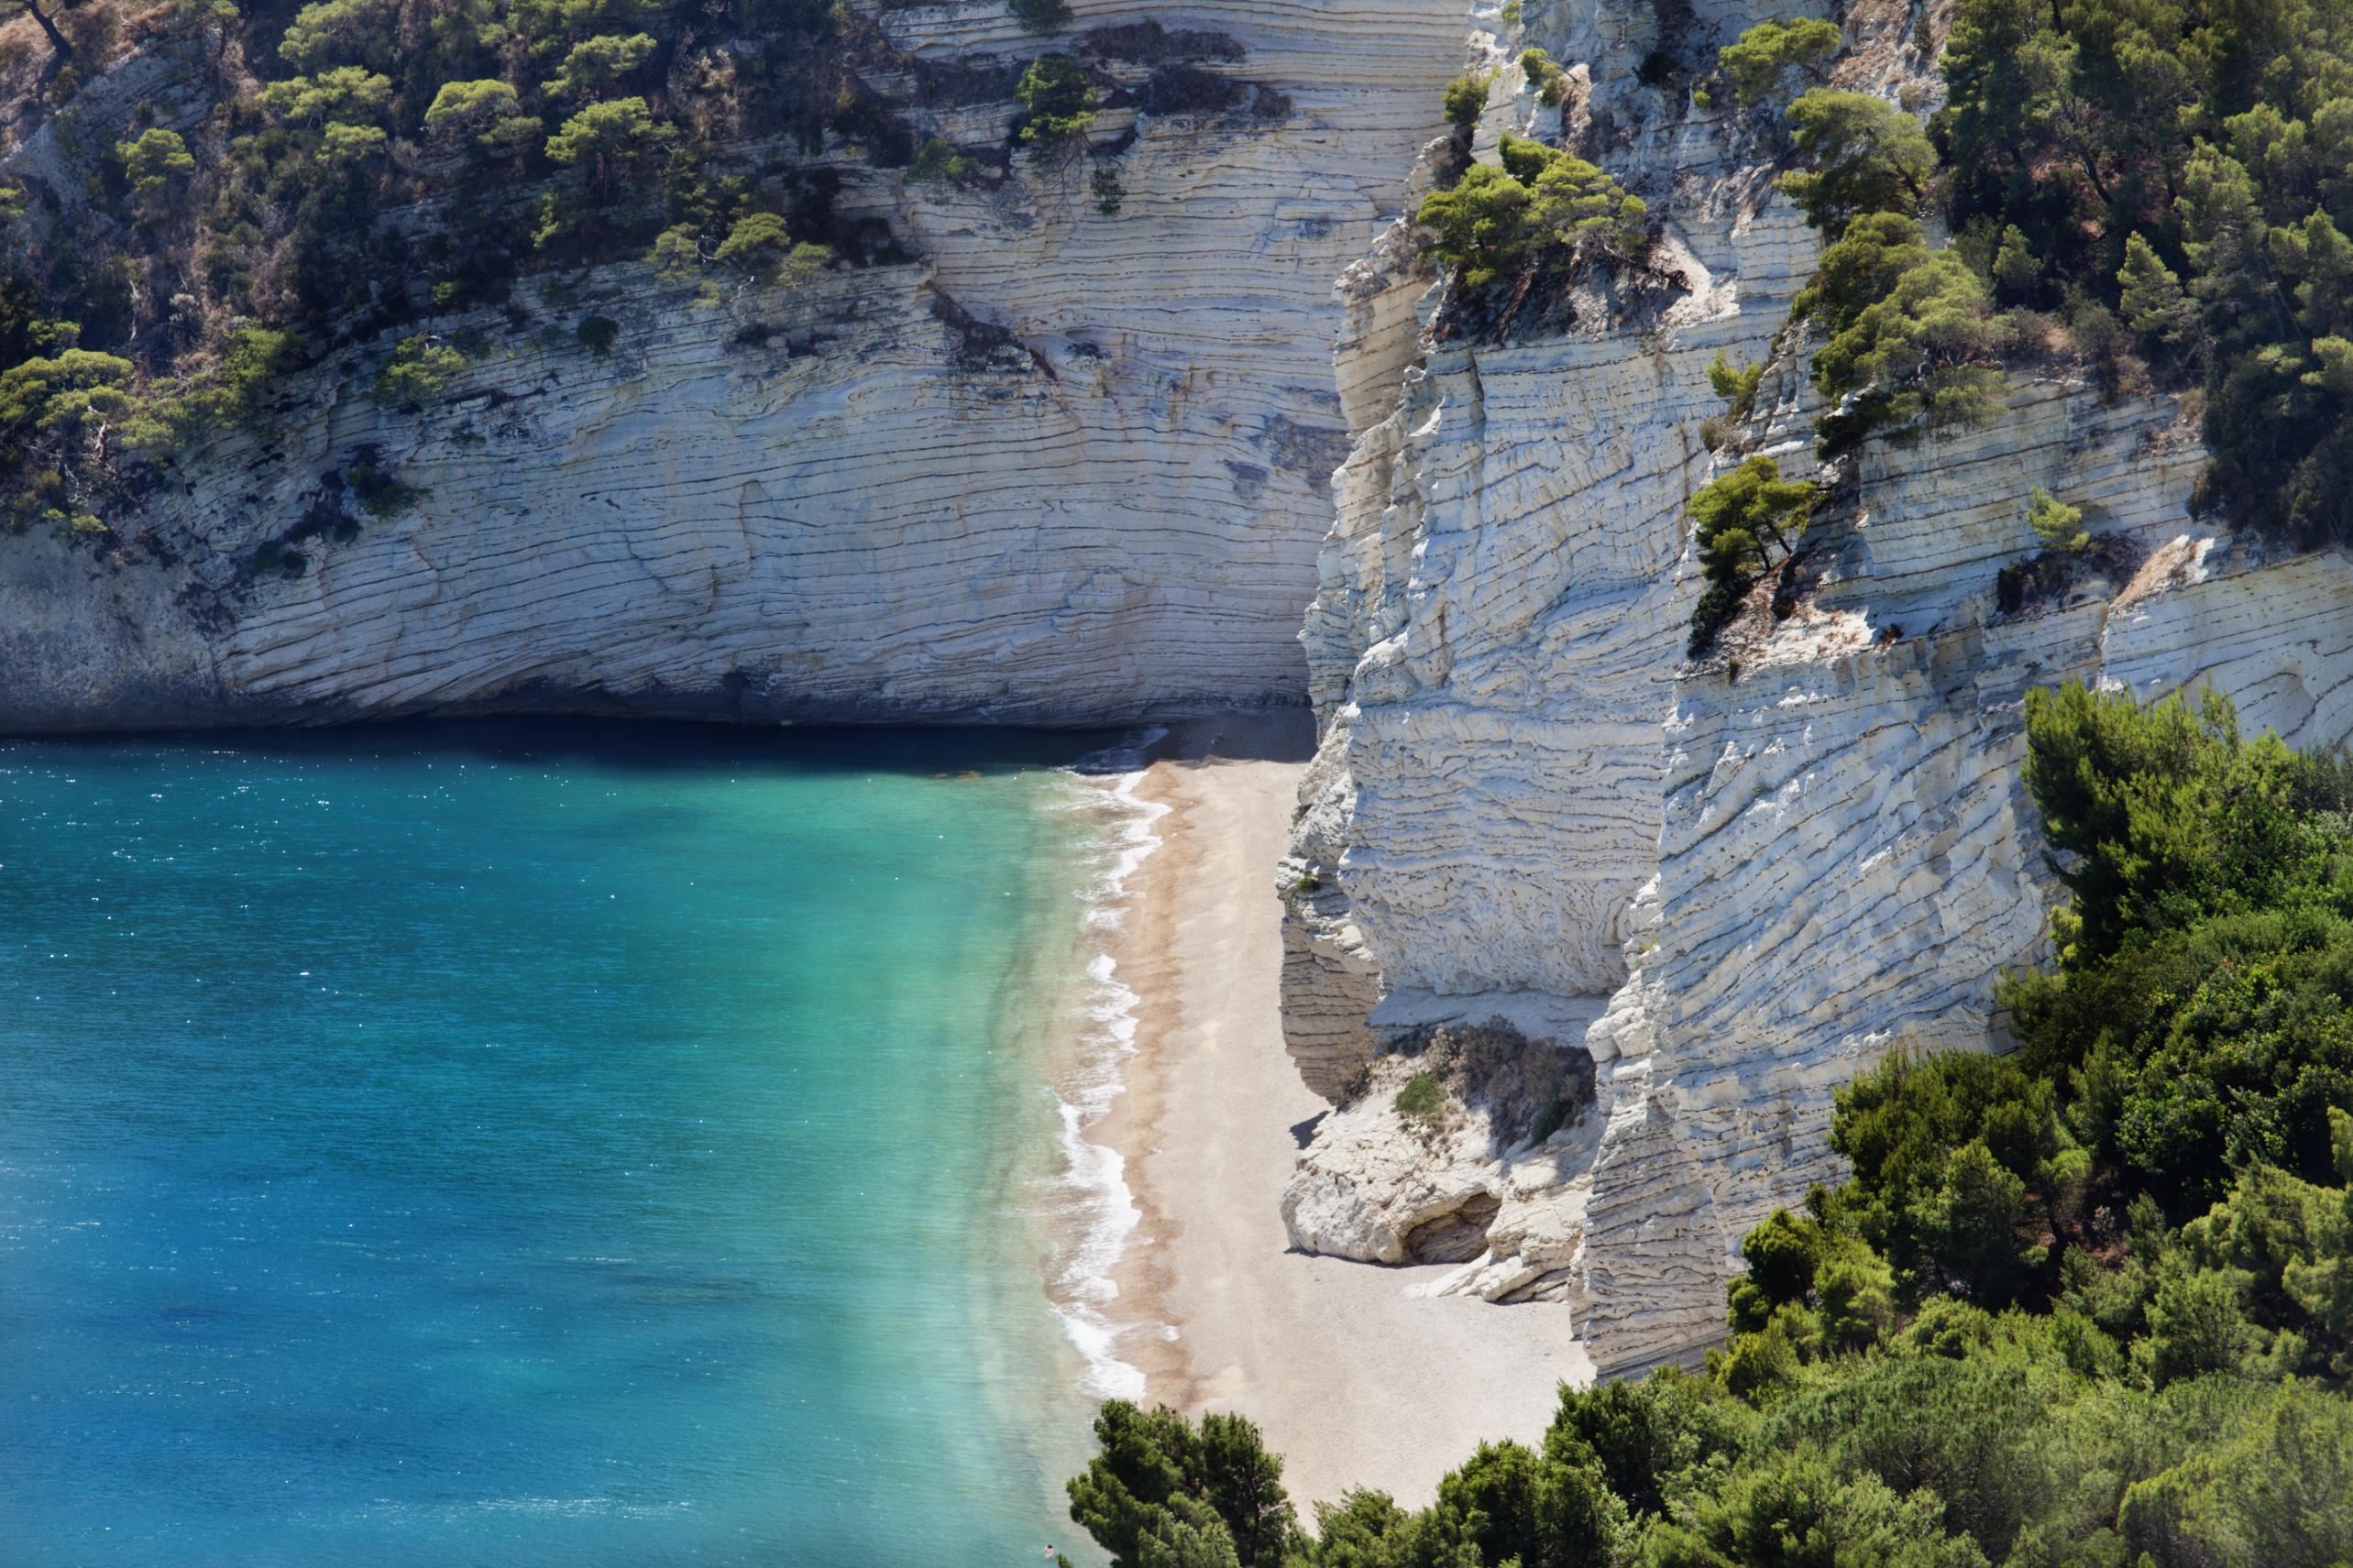 Puglia has some of Italy's top beaches